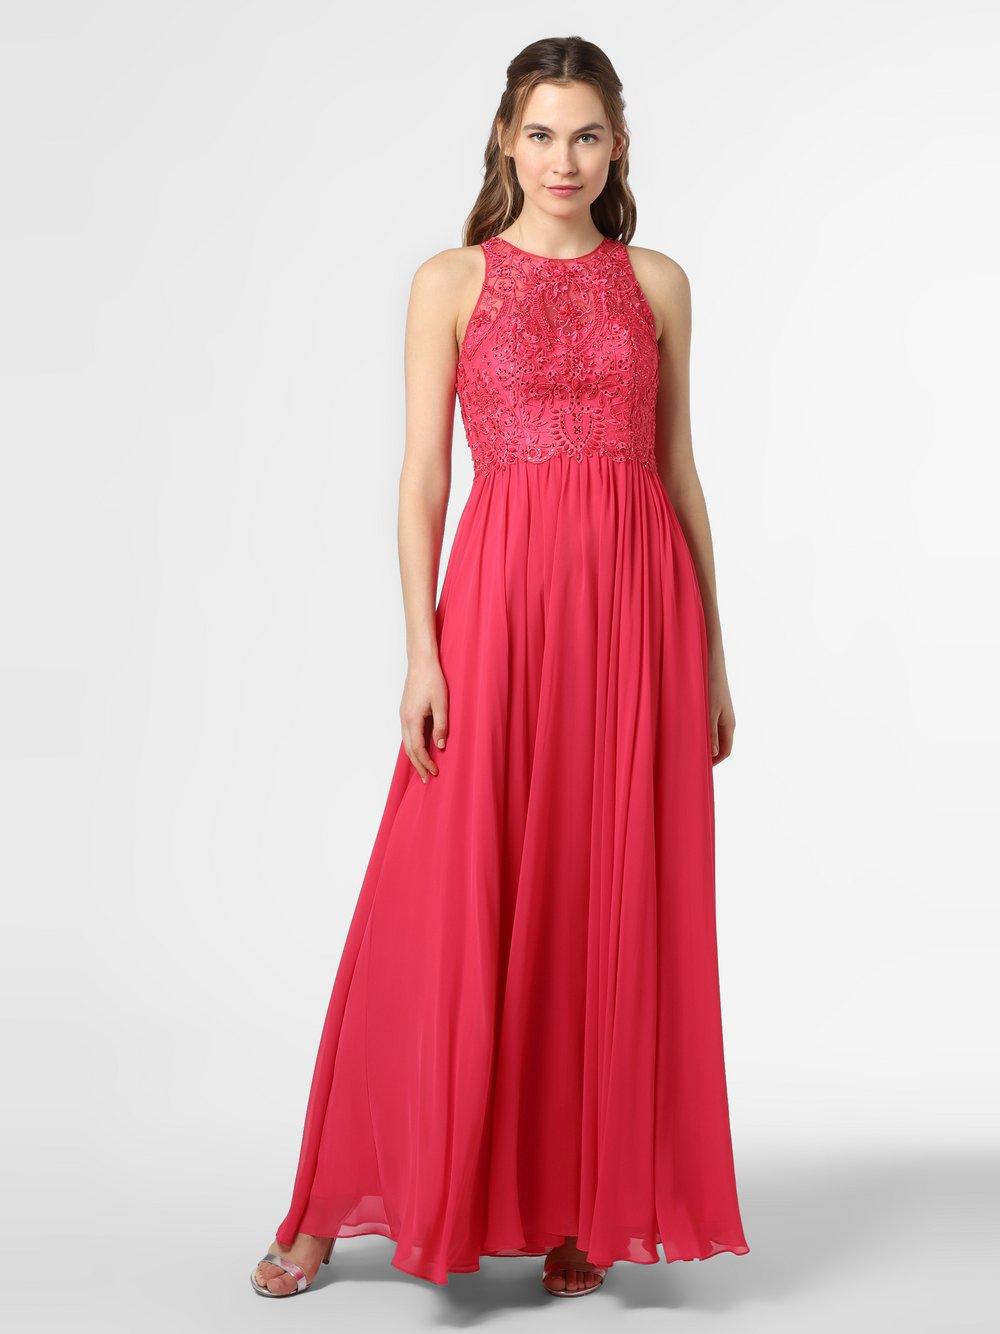 Laona – Damska sukienka wieczorowa, różowy Van Graaf 386277-0011-00380